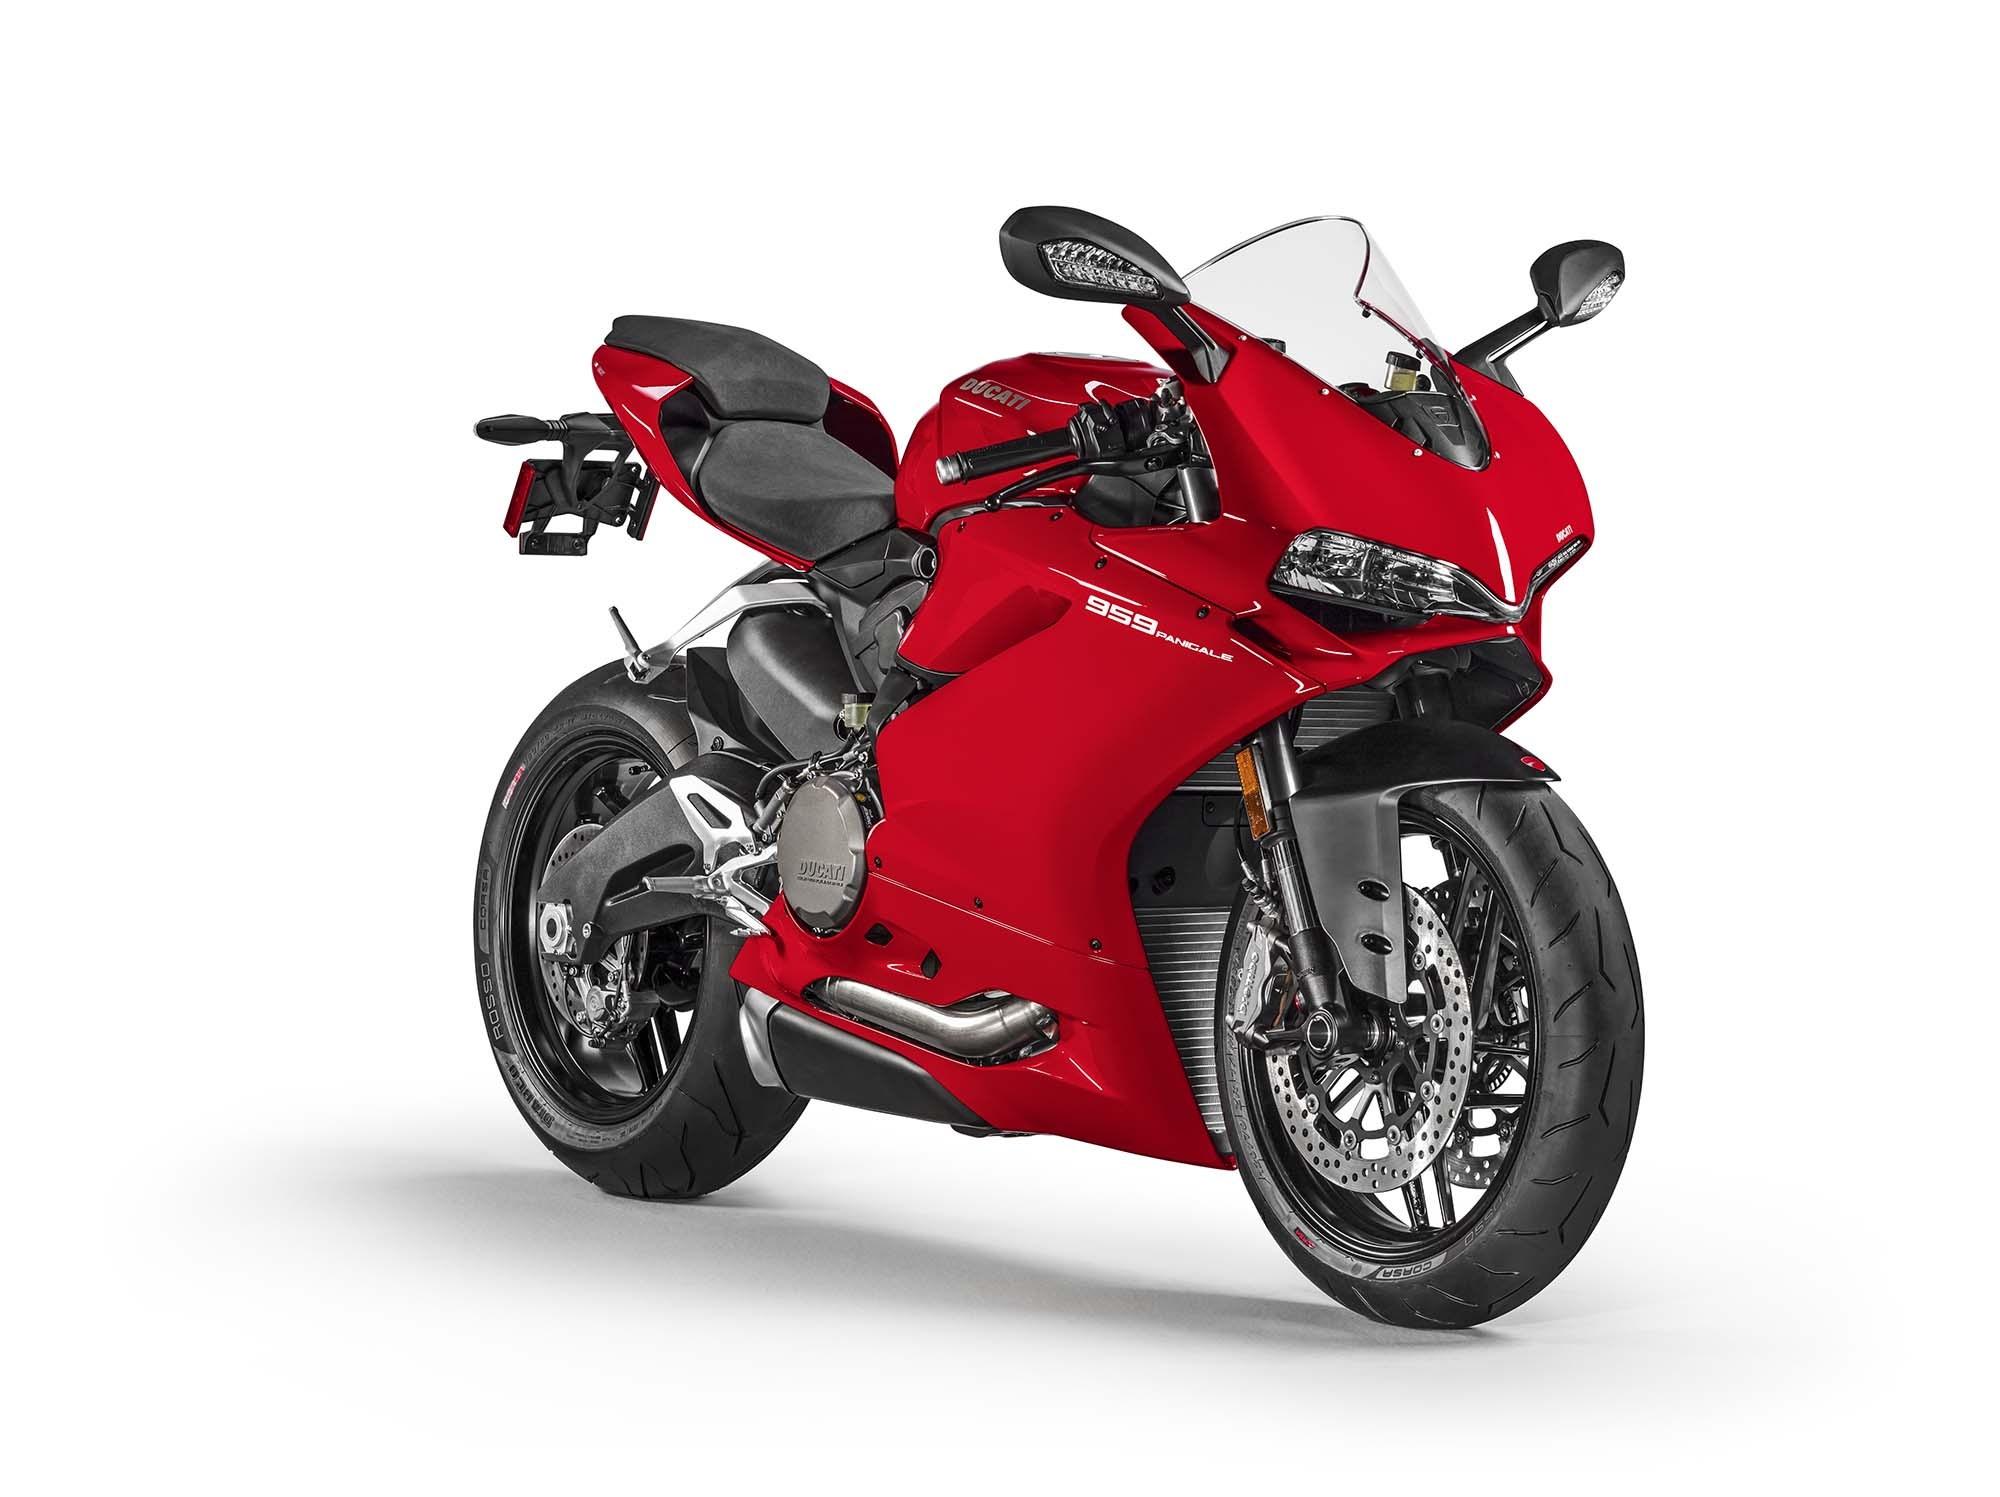 2016-Ducati-959-Panigale-USA-model-09 - BikesRepublic